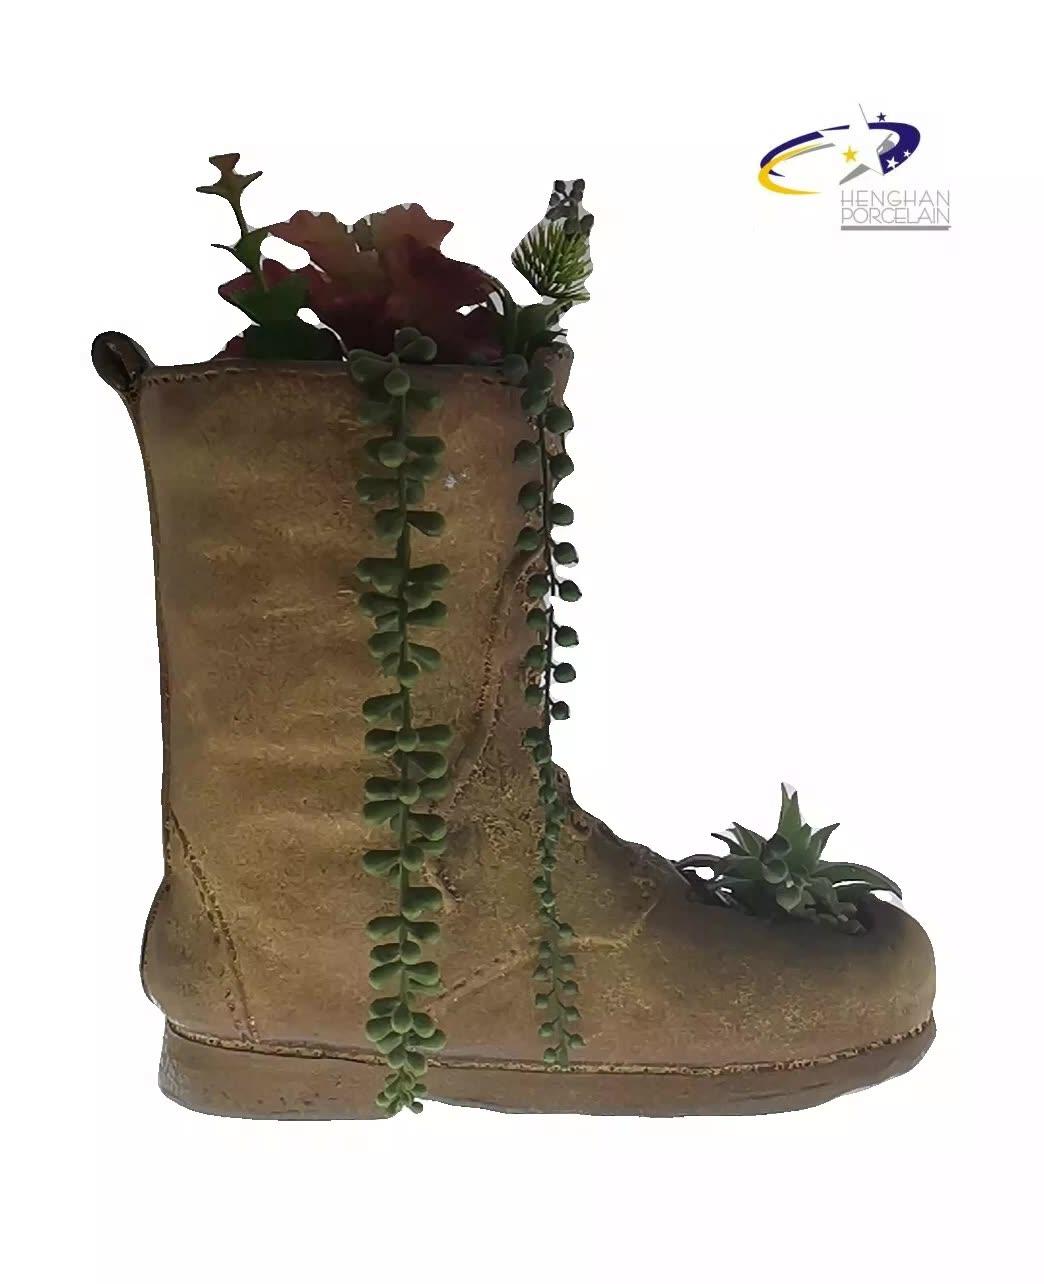 Barato por atacado ao ar livre de Cerâmica De barro vermelho sapato jardim pote plantador de vaso de flores de Cerâmica plantas suculentas vaso de flores